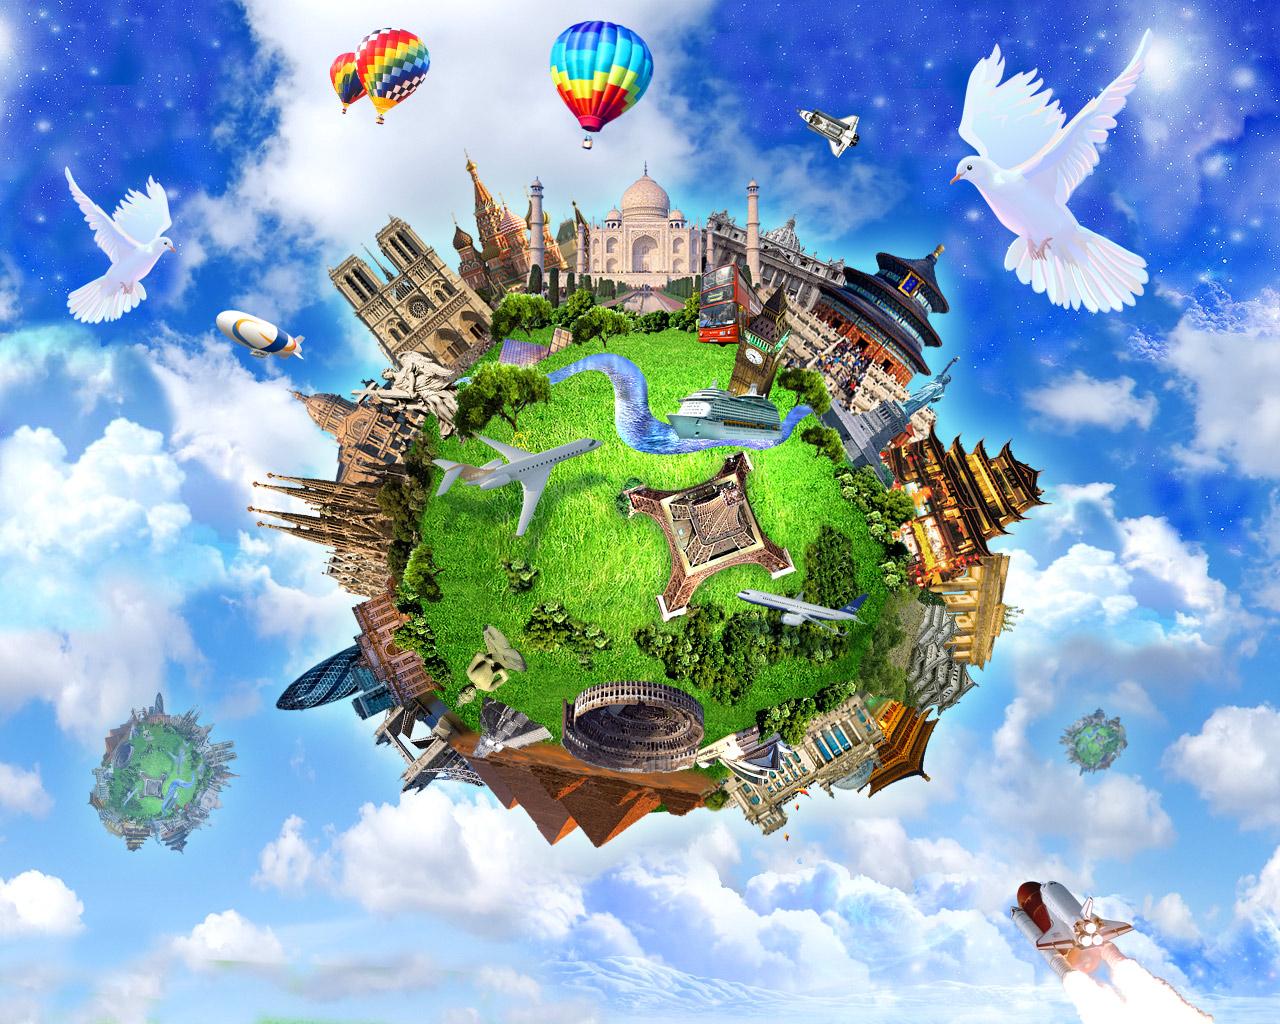 http://2.bp.blogspot.com/-XCyT4I0a9yY/TgxsqsfWHiI/AAAAAAAAAwE/JZh5_r7dk-k/s1600/creative+hd+wallpapers+92.jpg